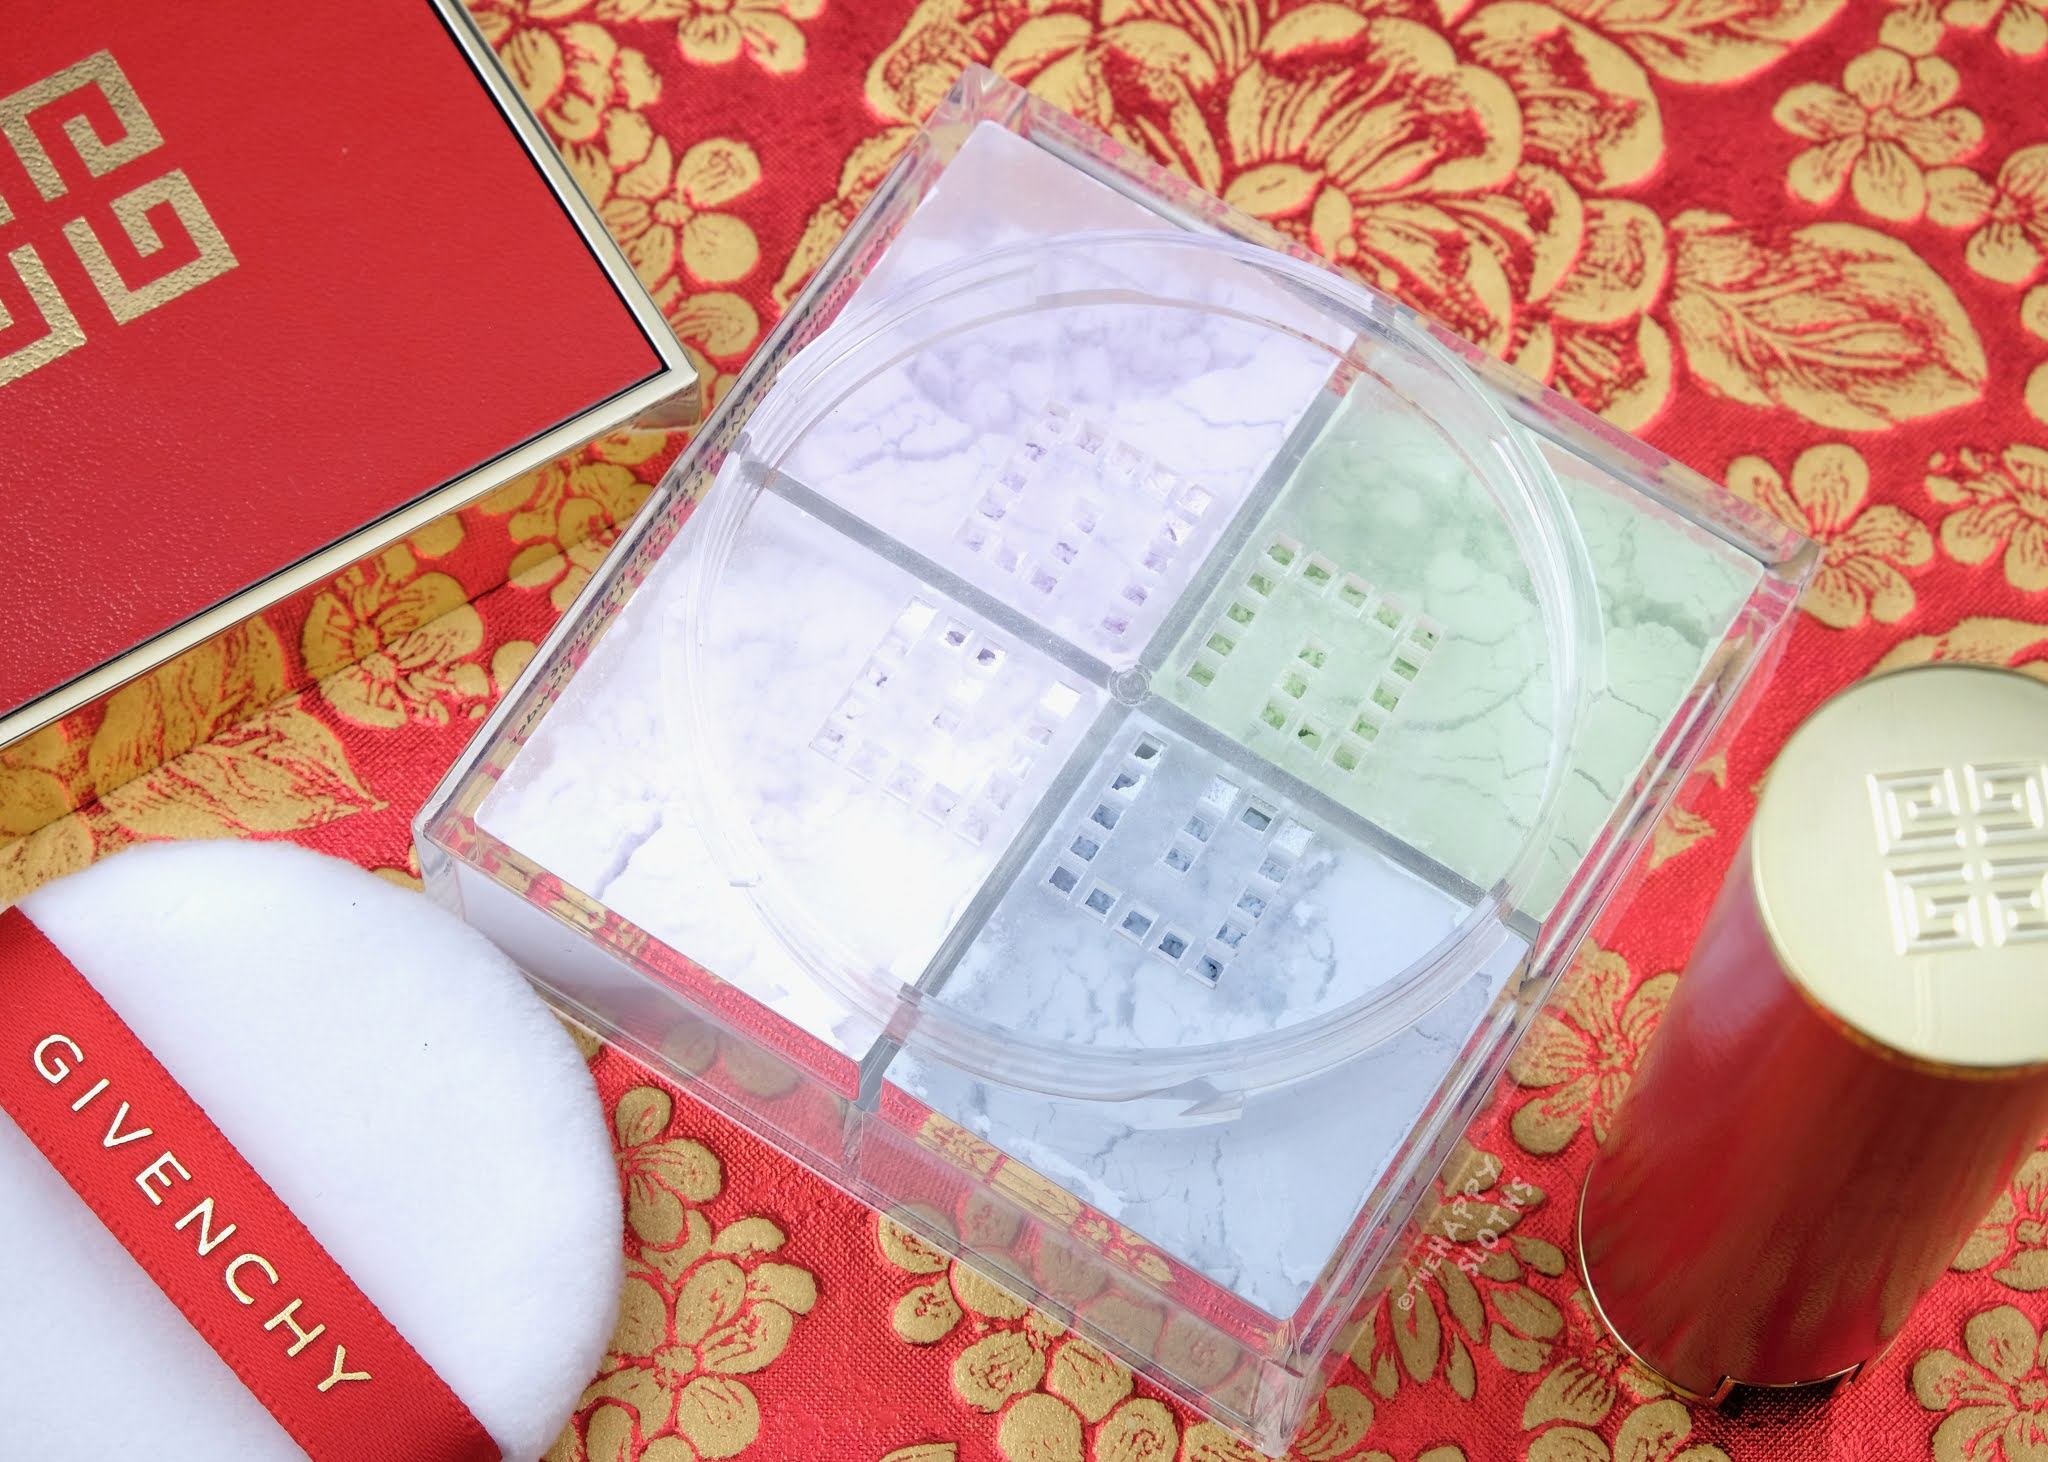 Givenchy | Prisme Libre Loose Powder Lunar New Year